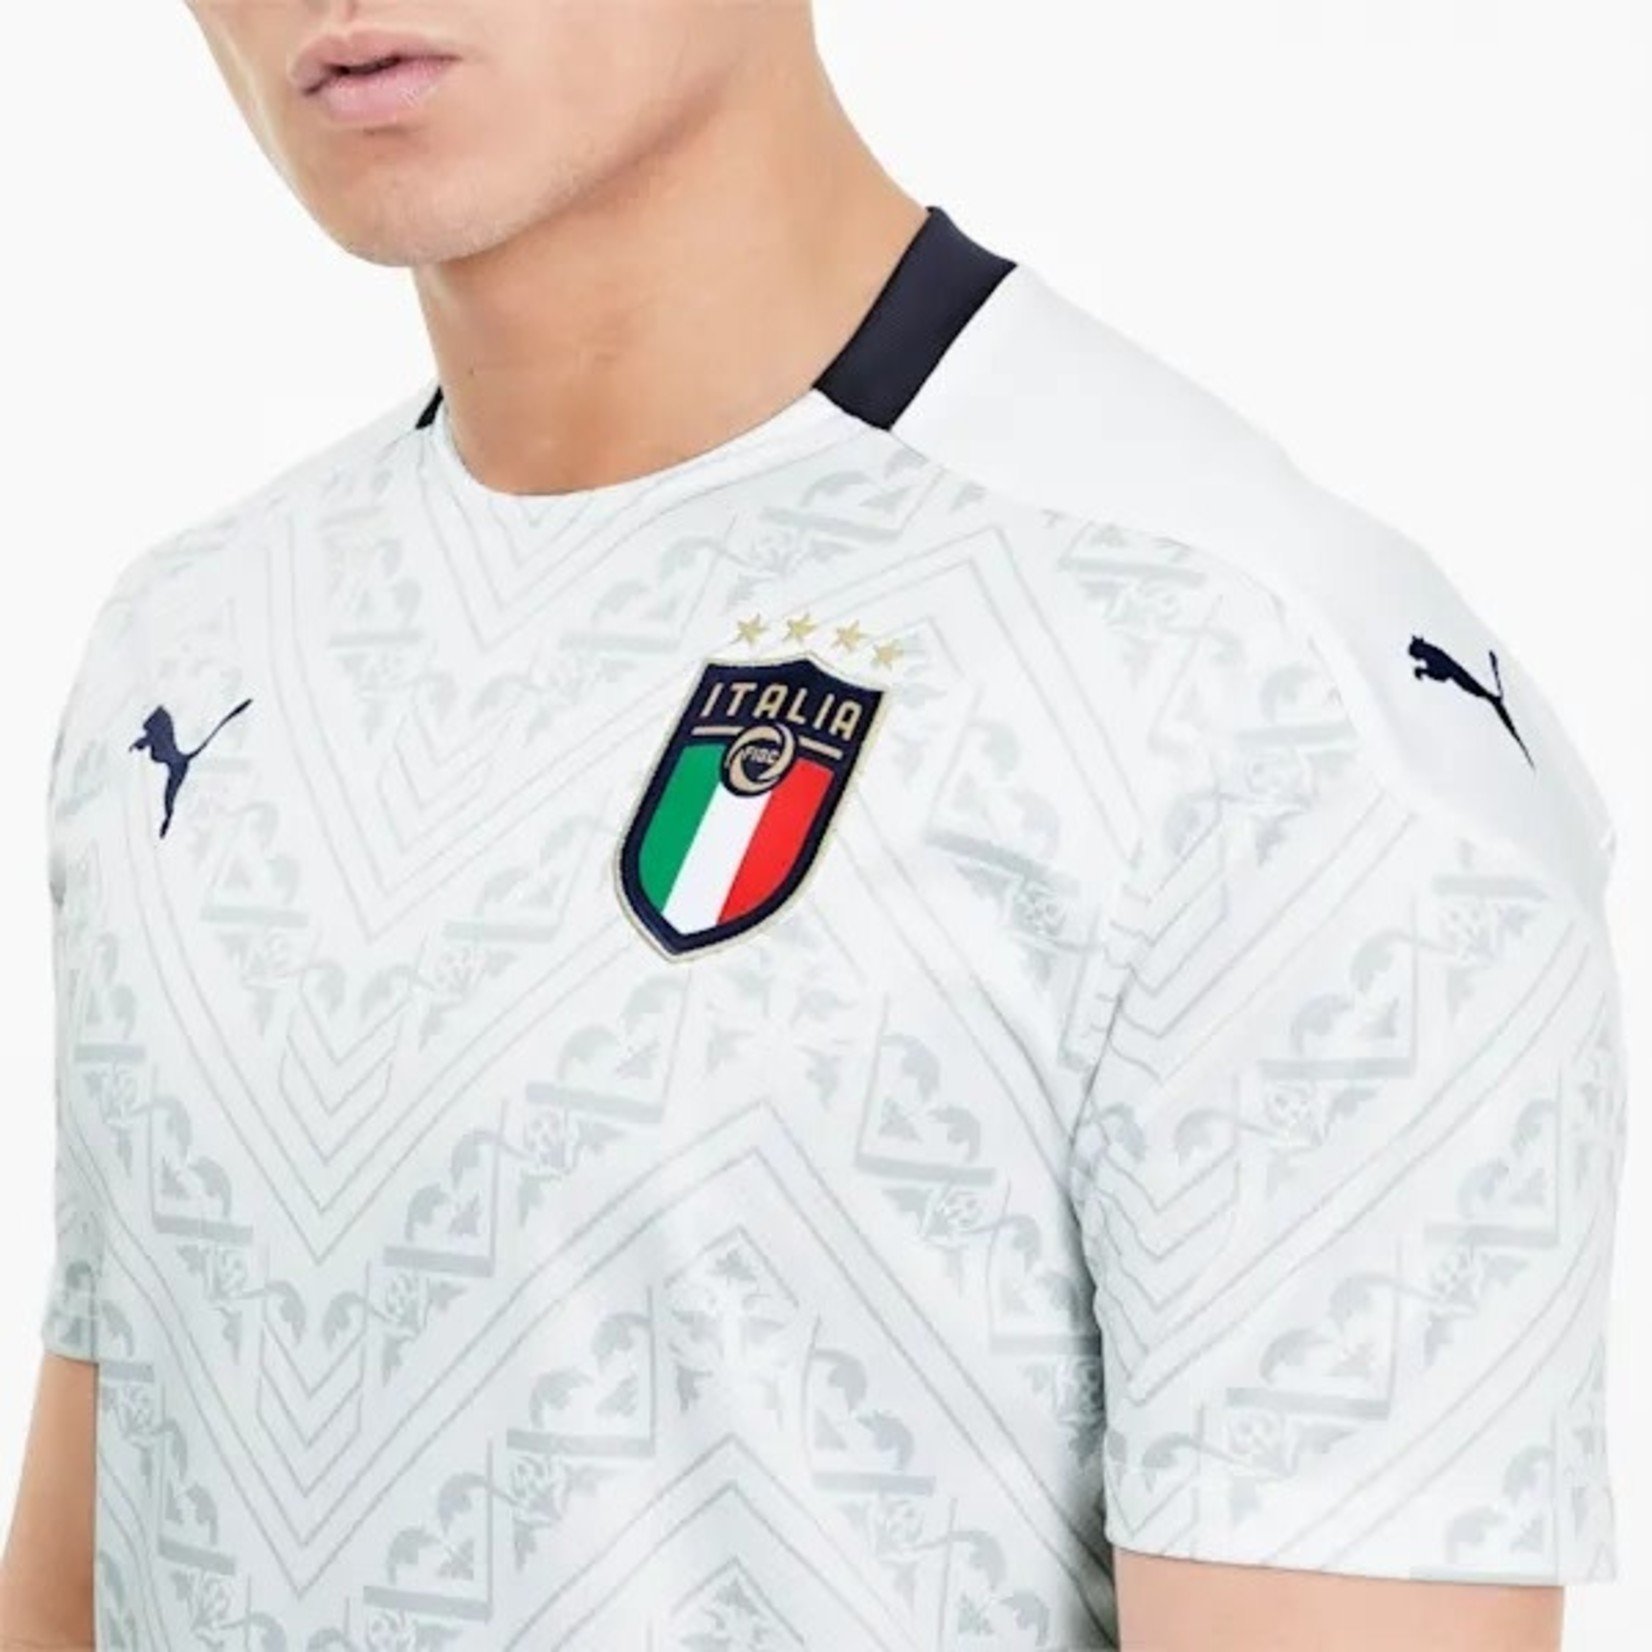 PUMA ITALY 2020 AWAY JERSEY (WHITE)